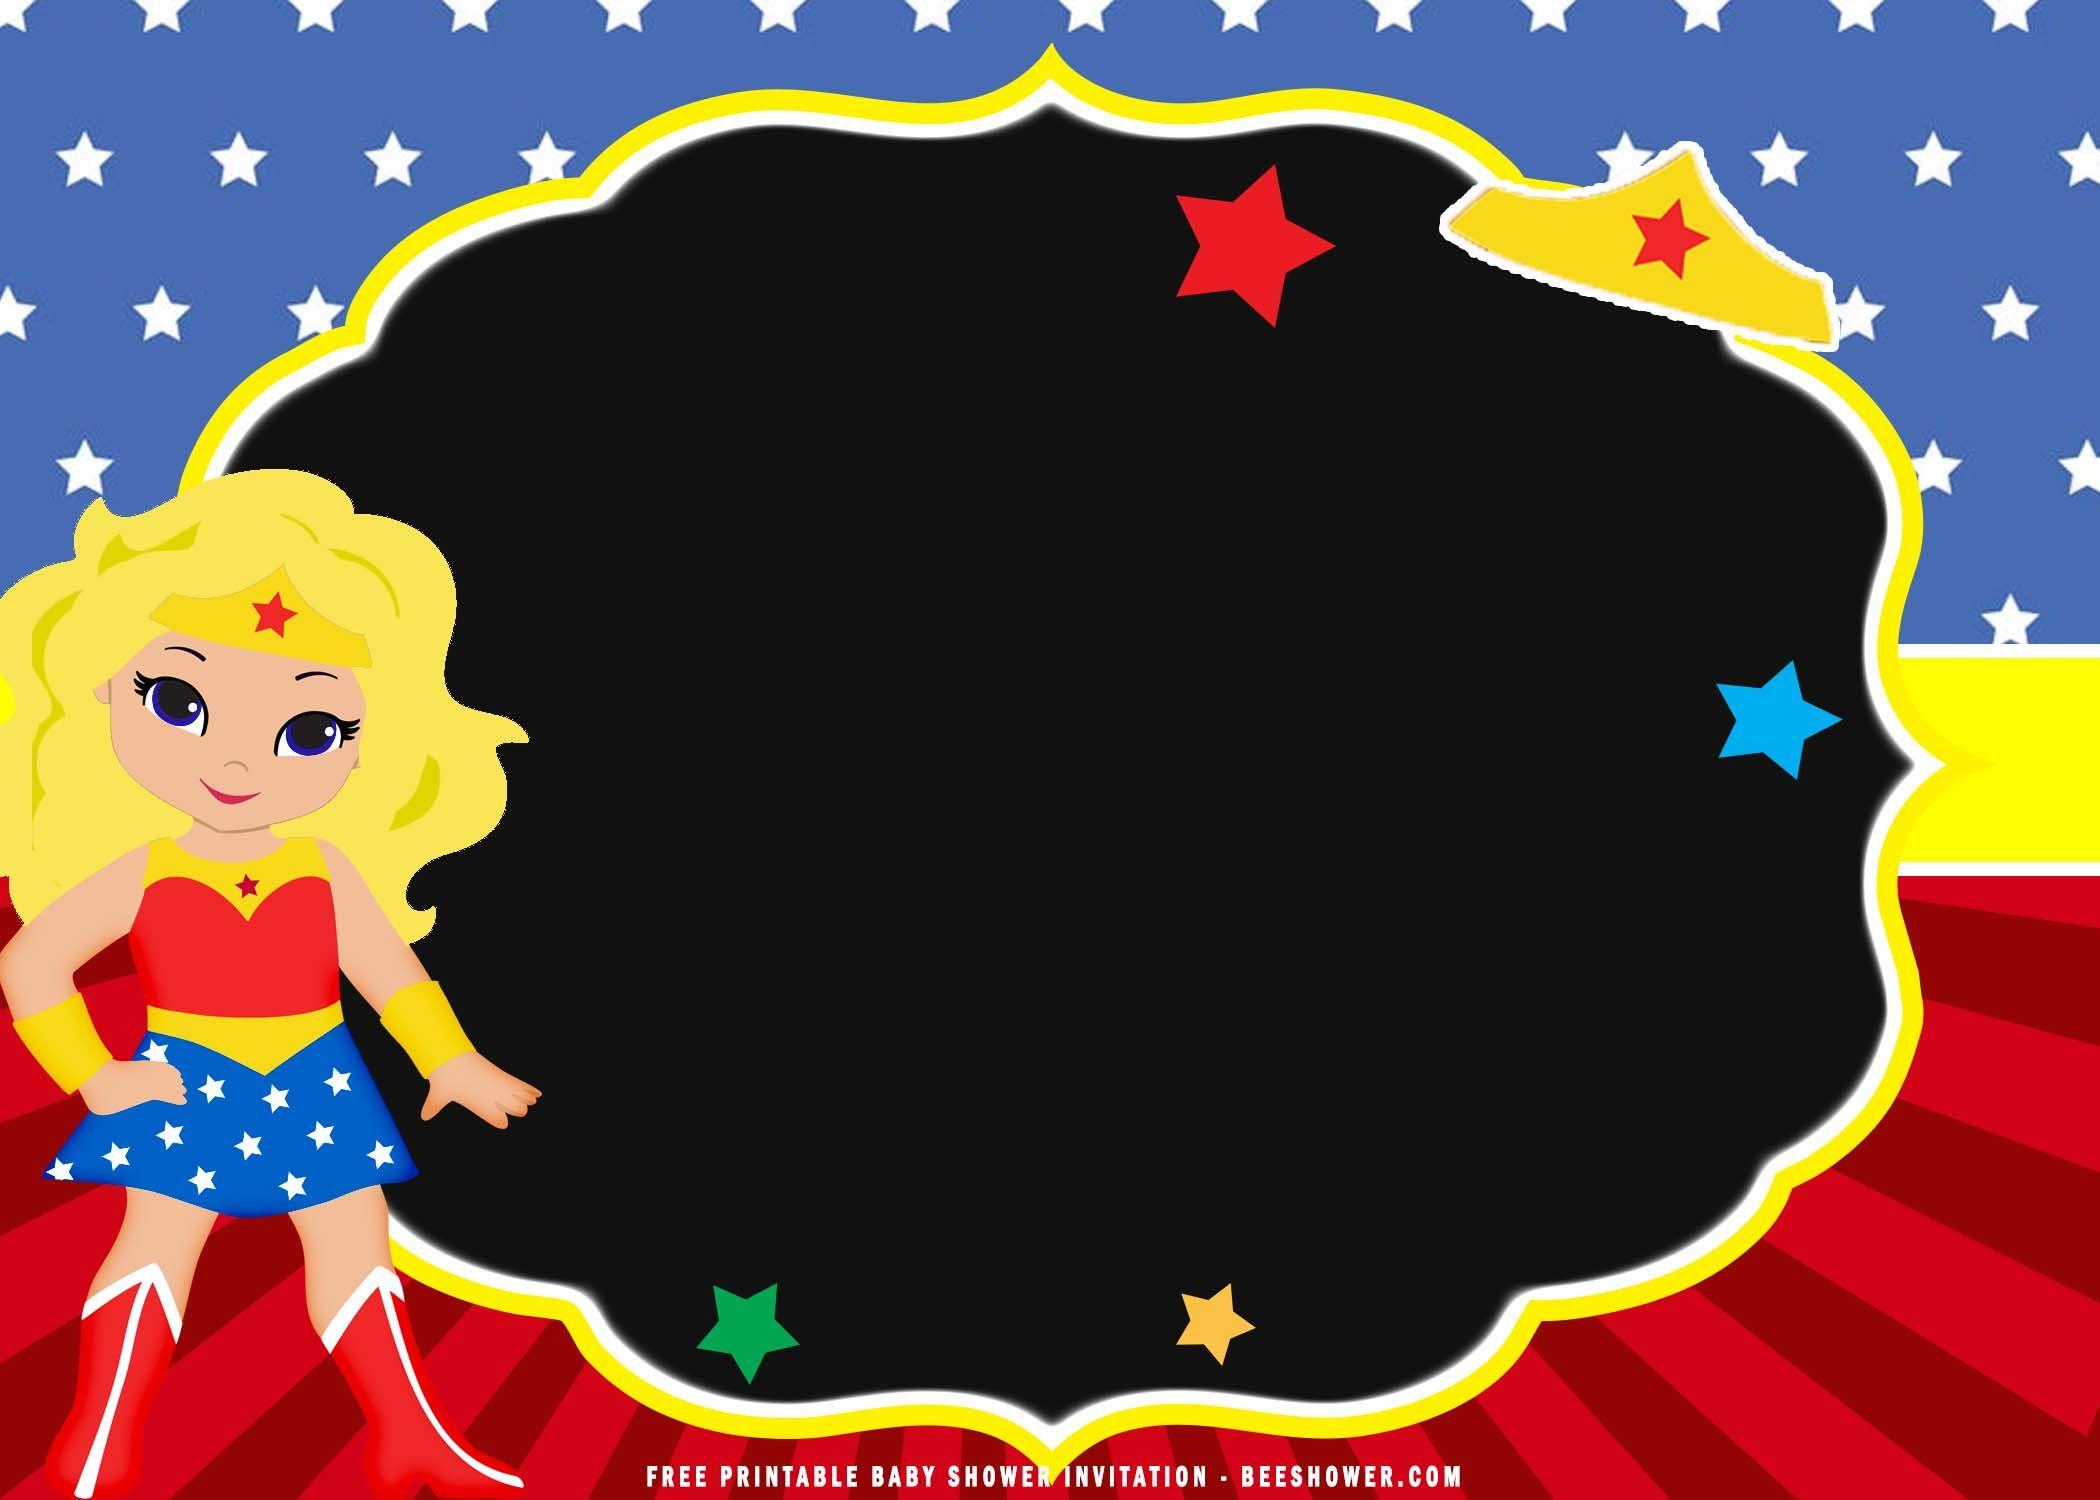 FREE Printable) - Chibi Wonder Woman Birthday Invitation Templates